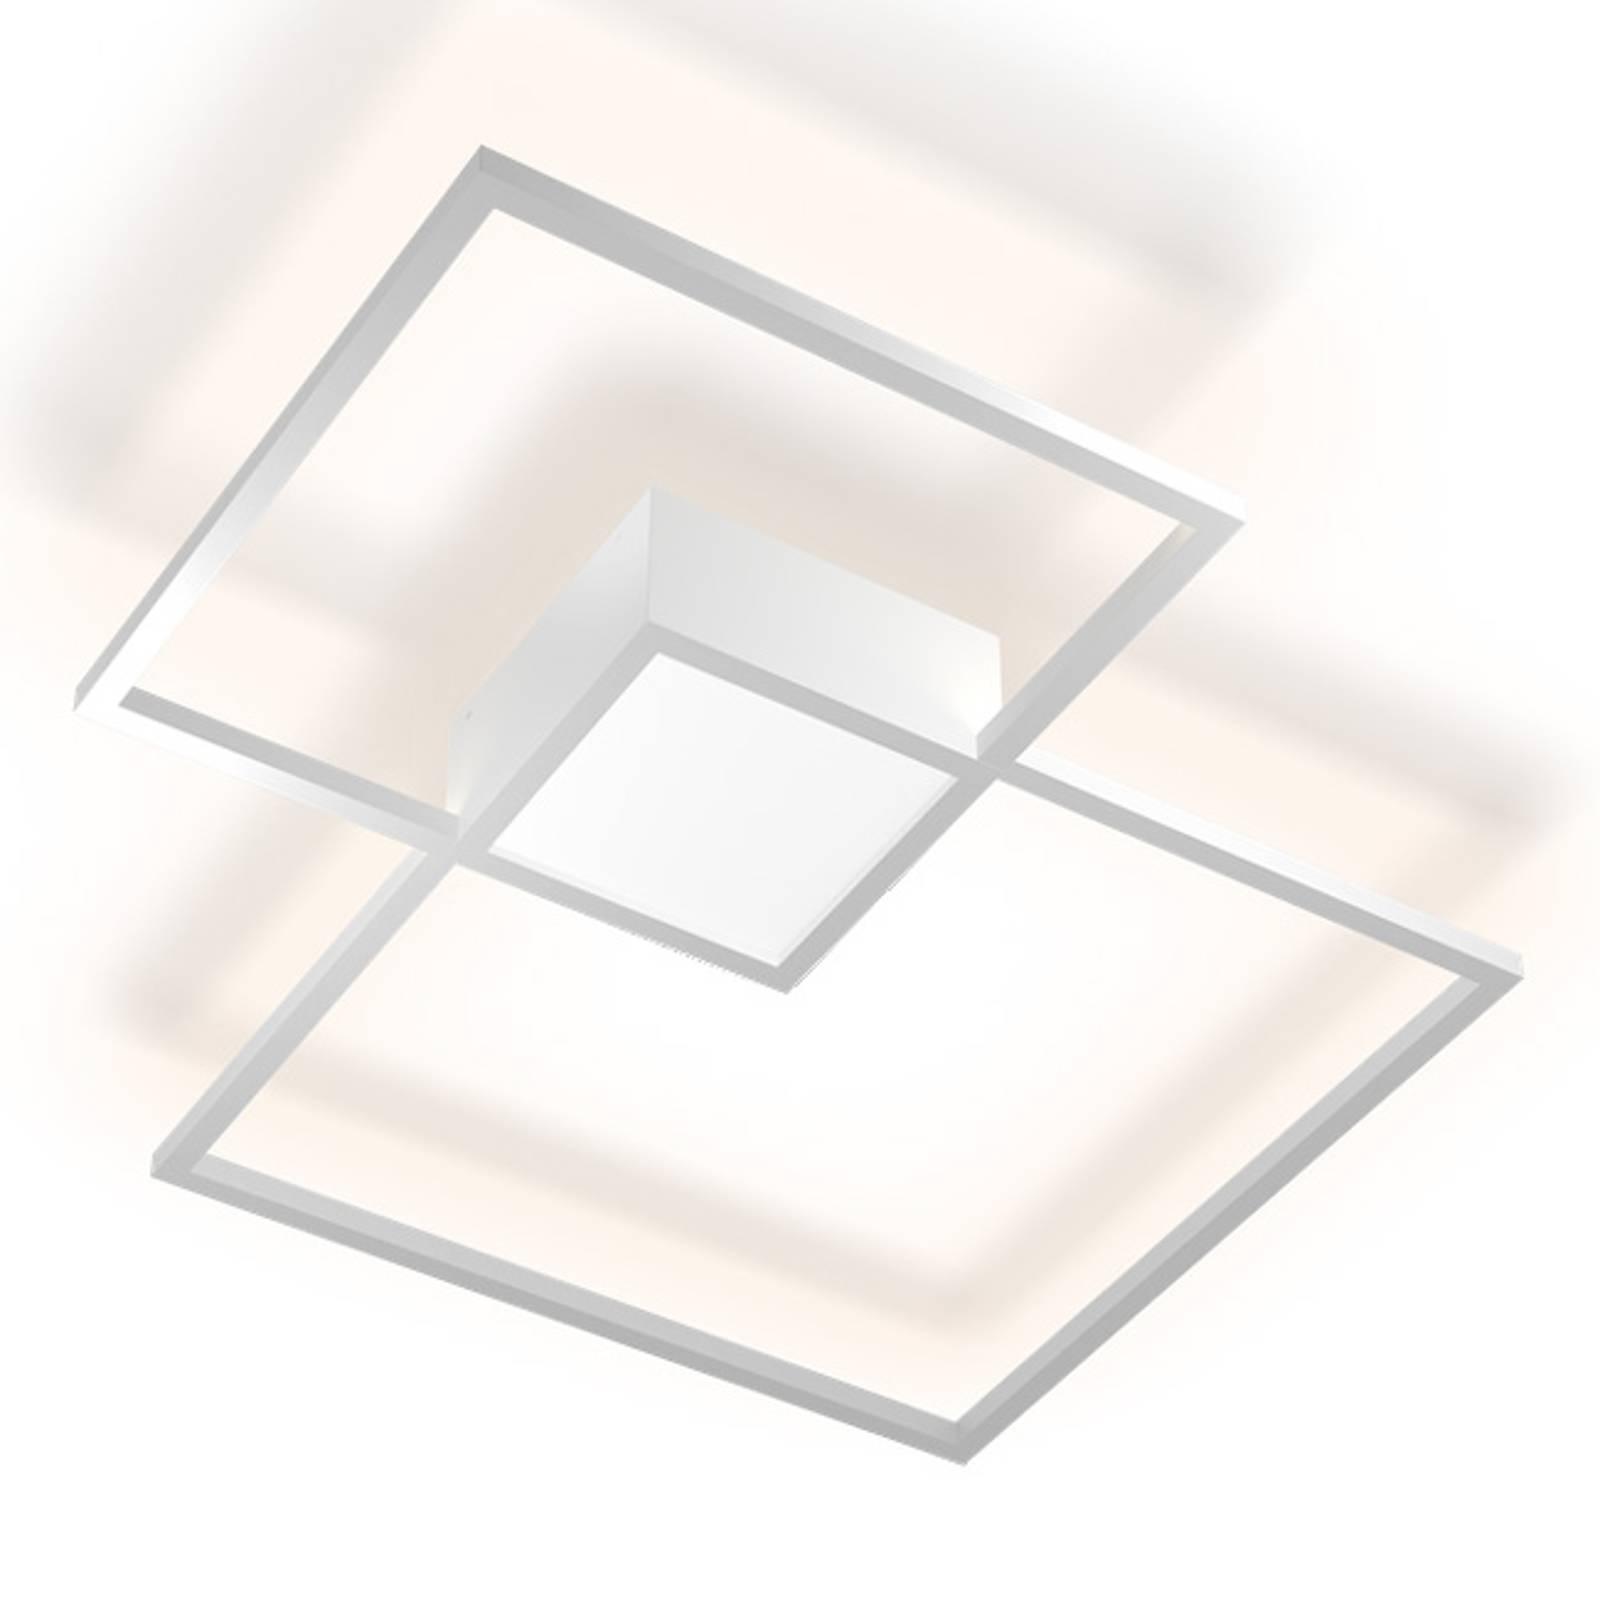 WEVER & DUCRÉ Venn 2.0 Decke 47W 2.700K weiß günstig online kaufen